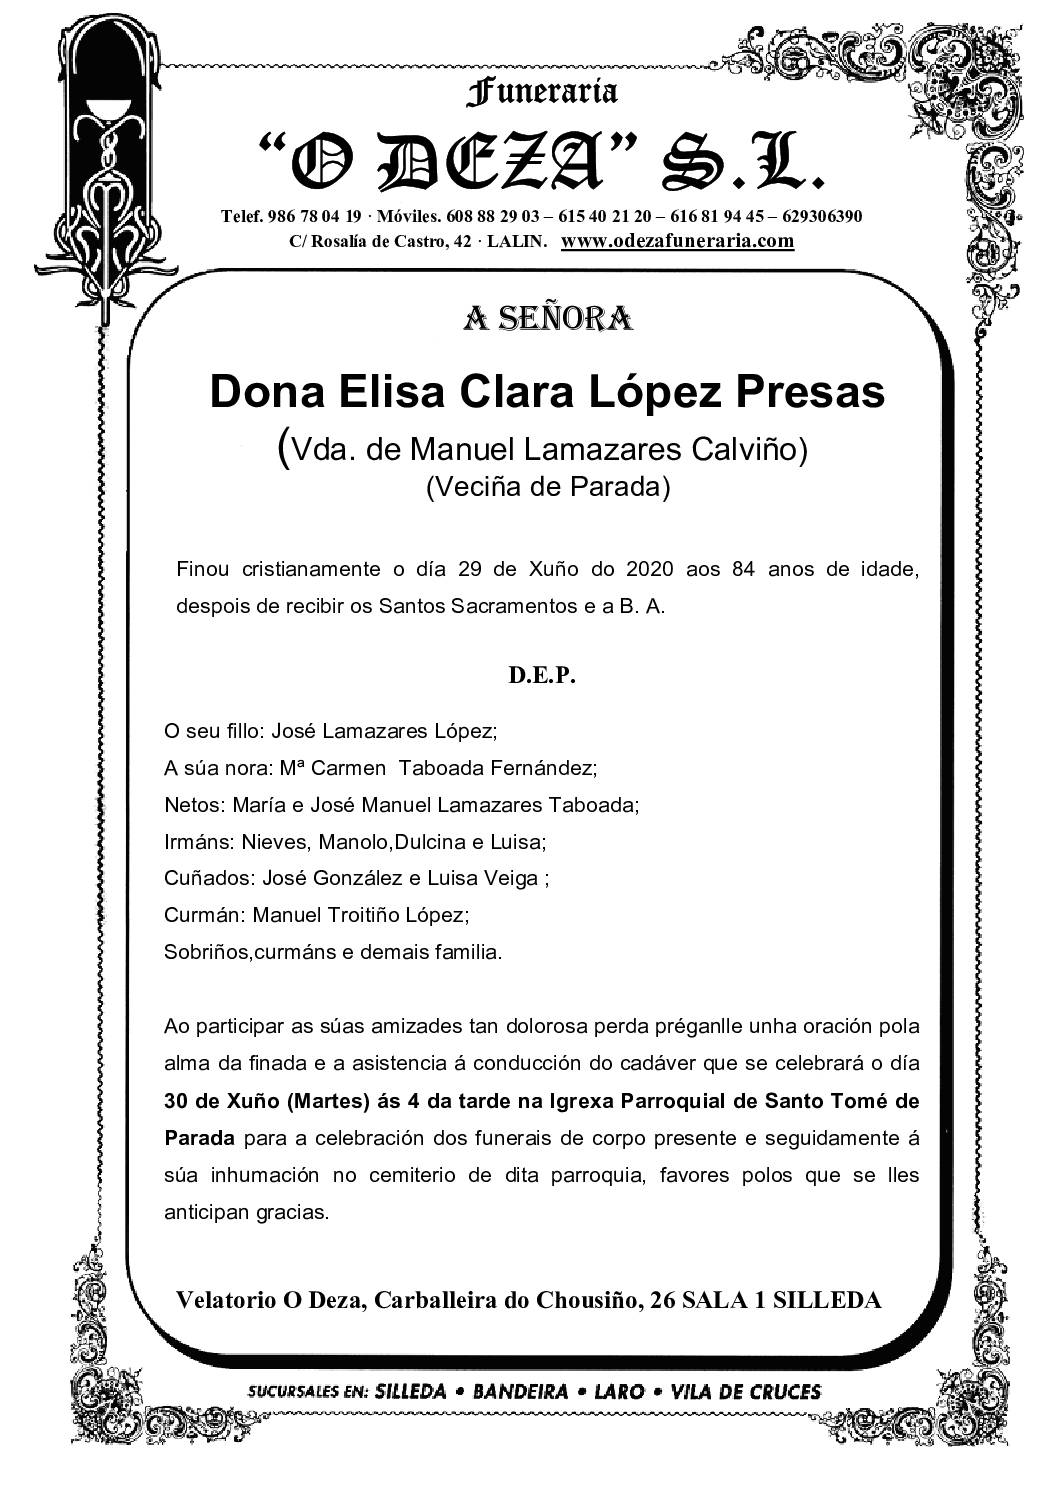 DNA. ELISA CLARA LÓPEZ PRESAS